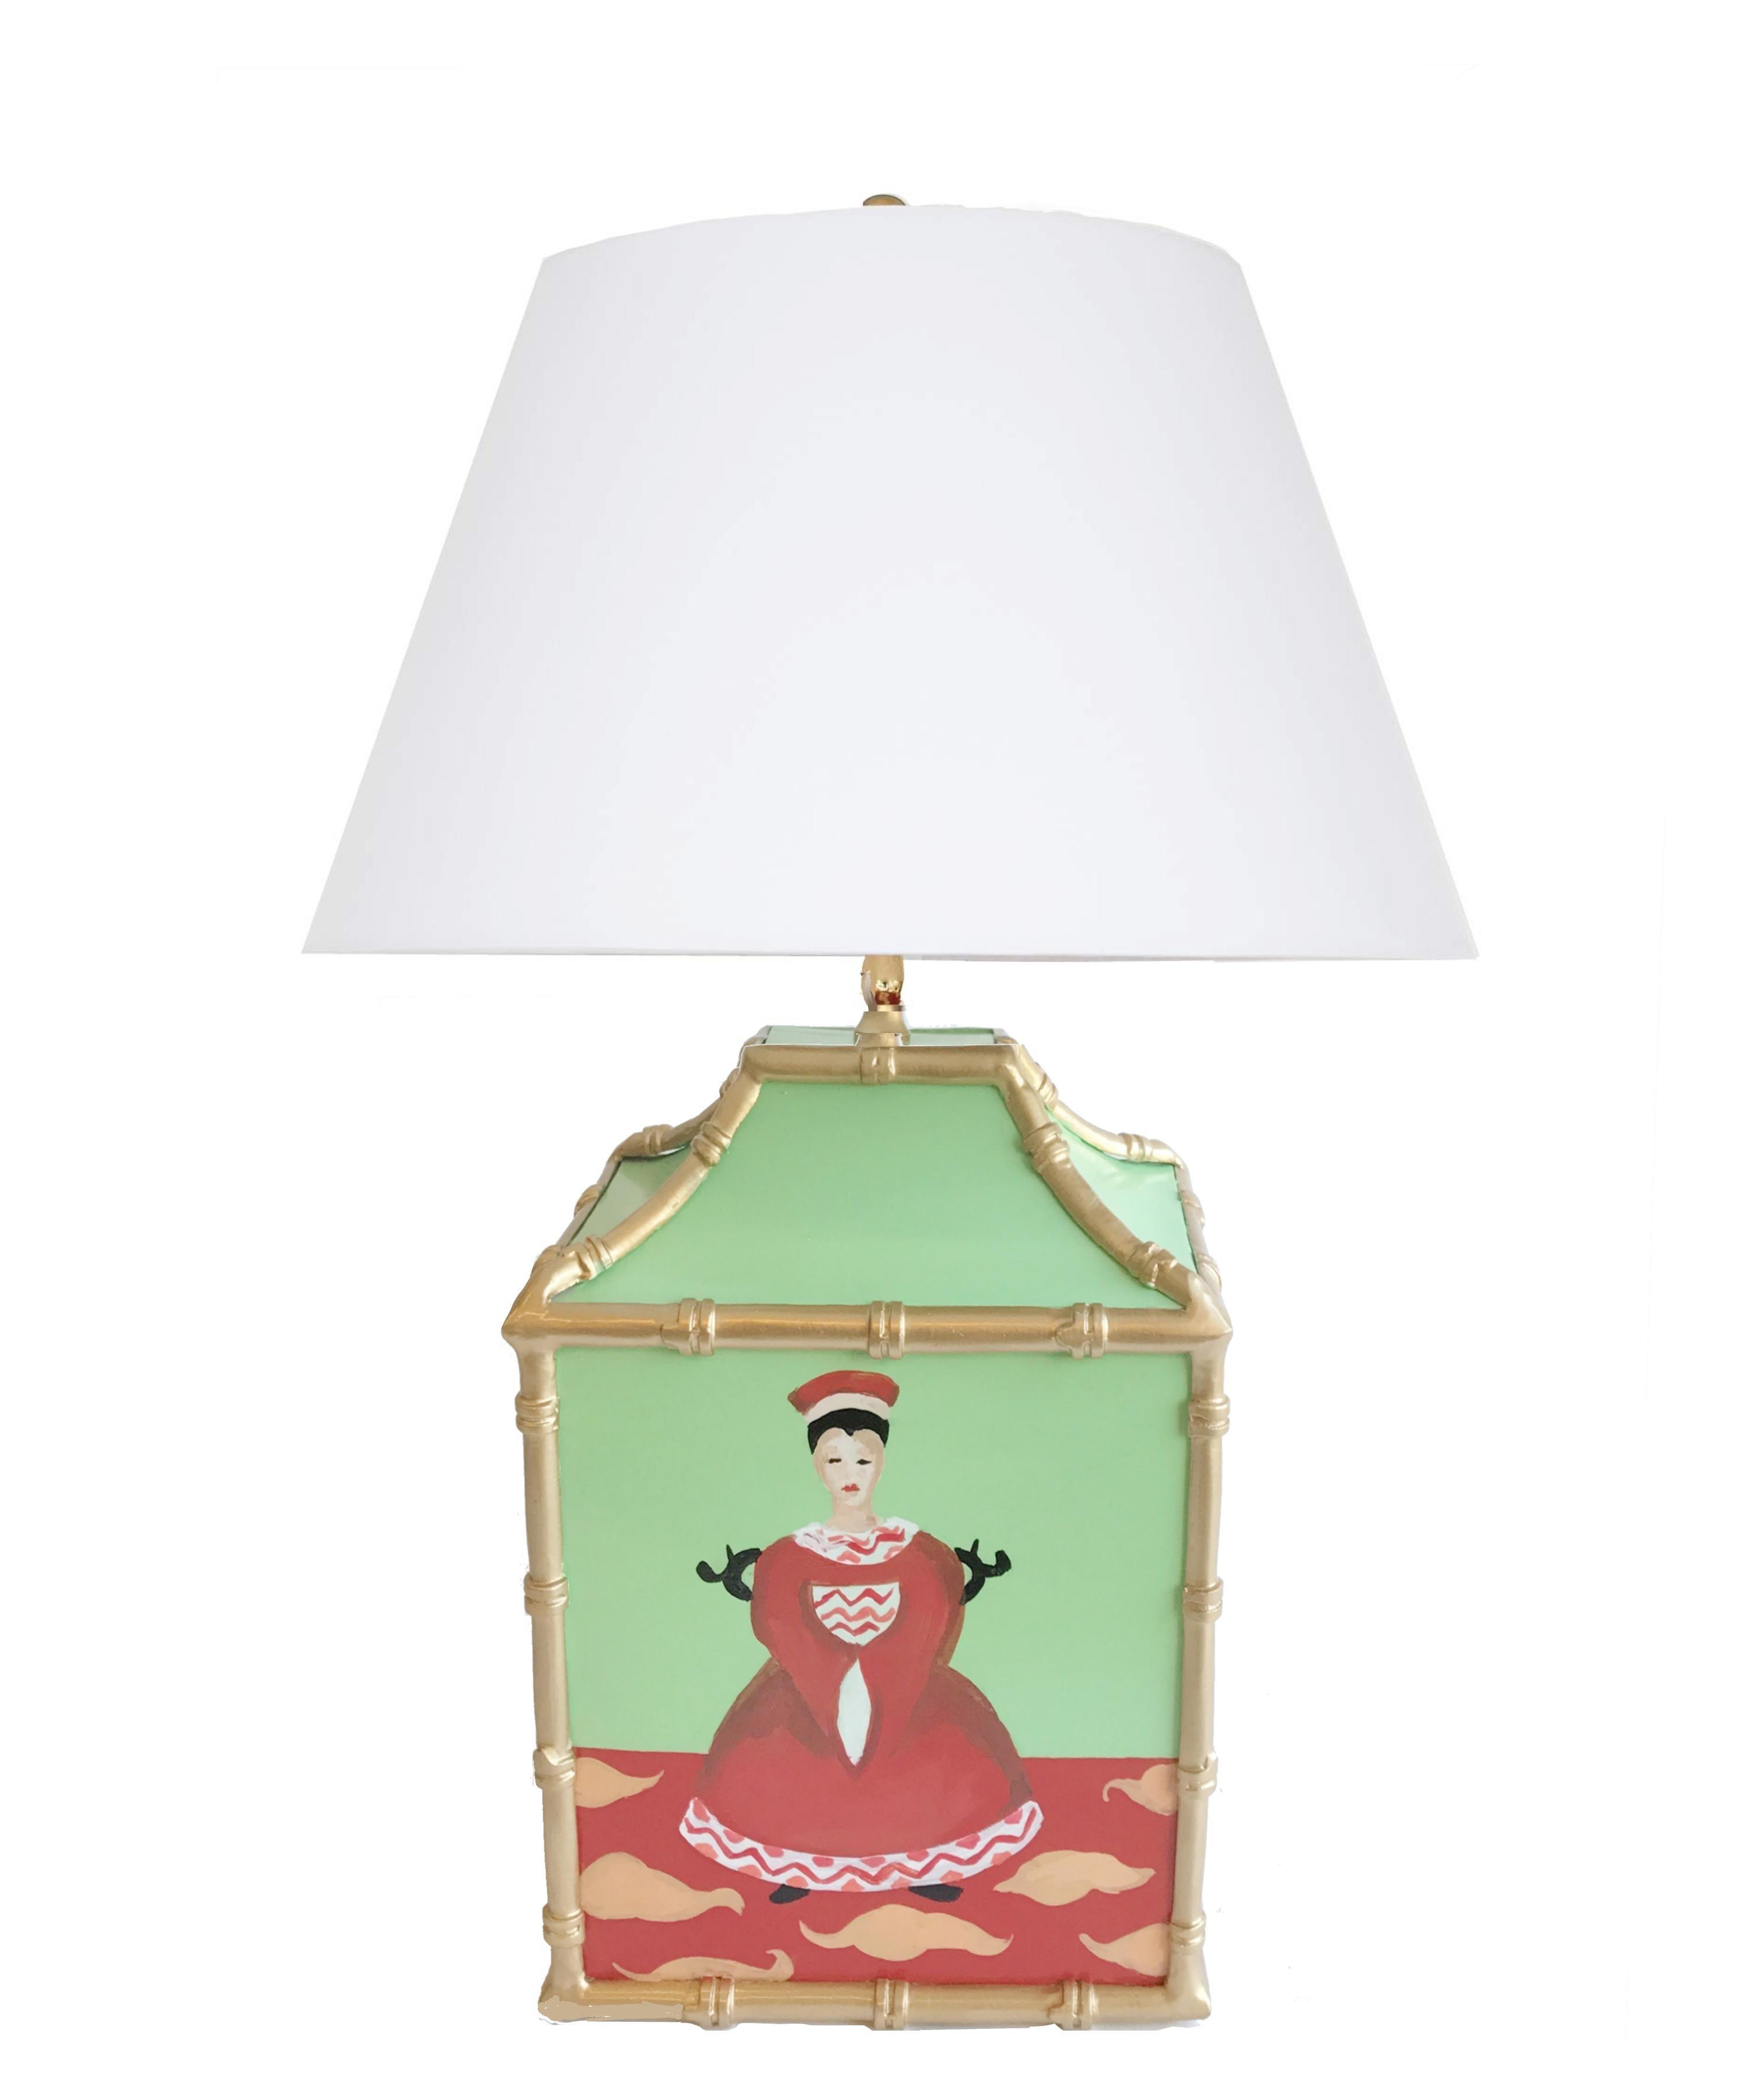 Charming Dana Gibson Custom Painted Pagoda Lamps   A Pair   Image 3 Of 3